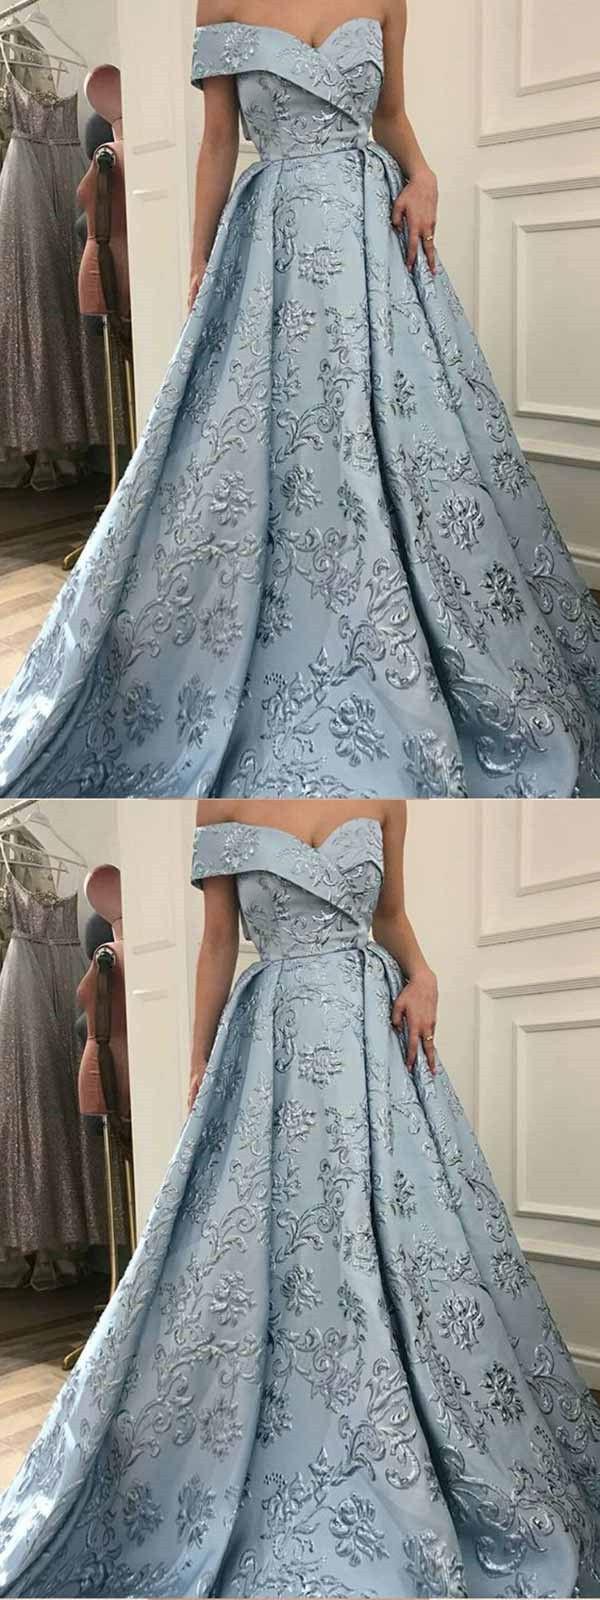 Vintage Blue Prom Dress Lace One Shoulder Prom Dress With Sleeve #VB2649